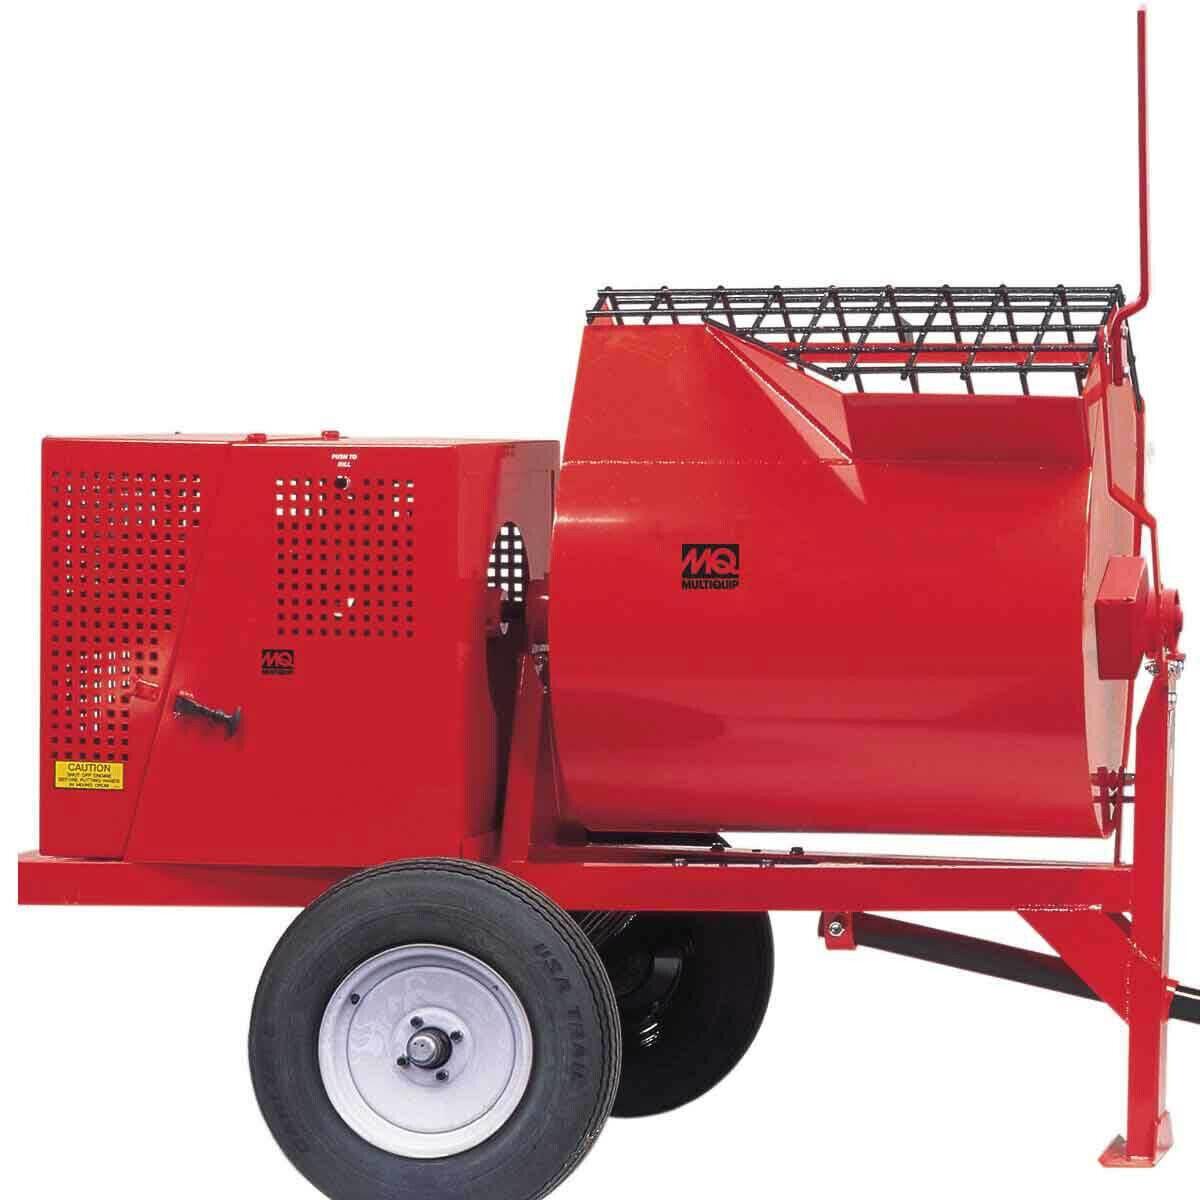 Multiquip Towable Mortar Mixer